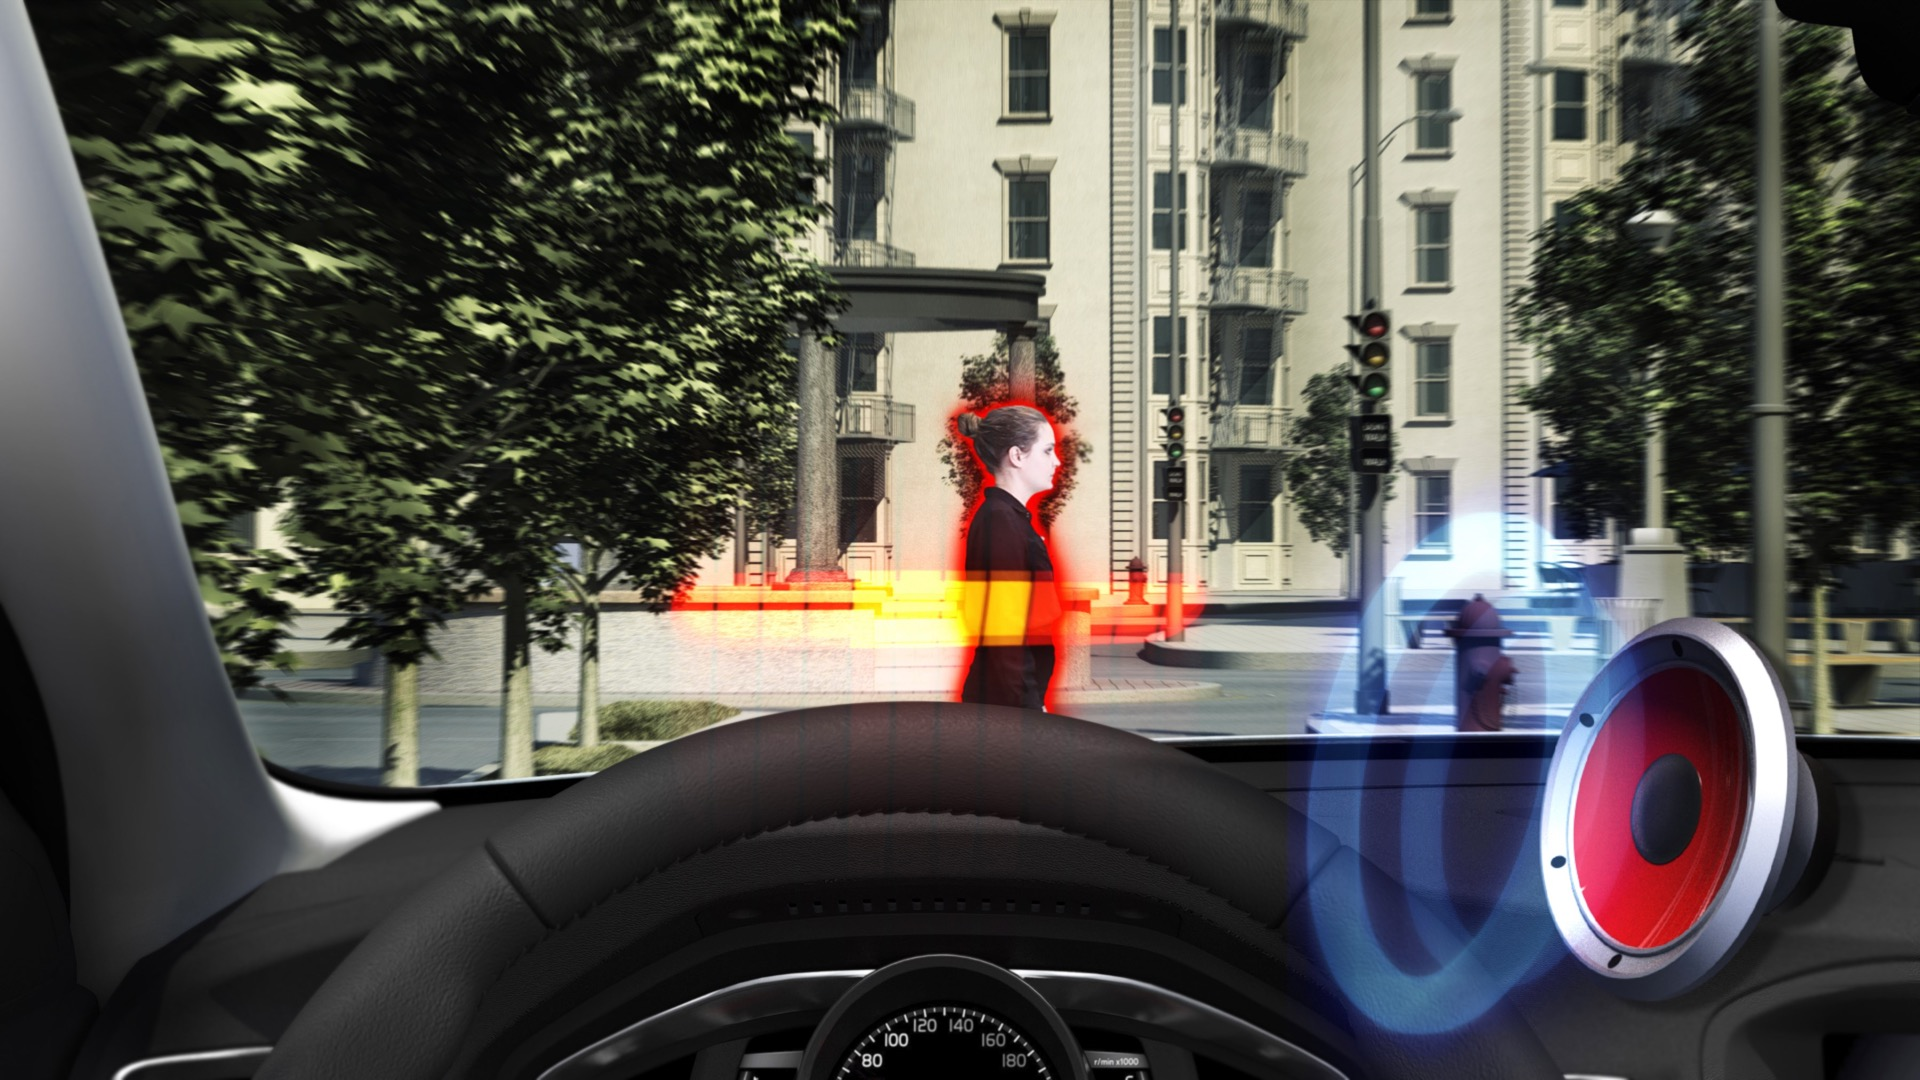 Pedestrian Detection With Full Auto Brake -  2013, 2014, Images, S60, S80, Safety, Technology, V60, V70, Volvo, XC60, XC70